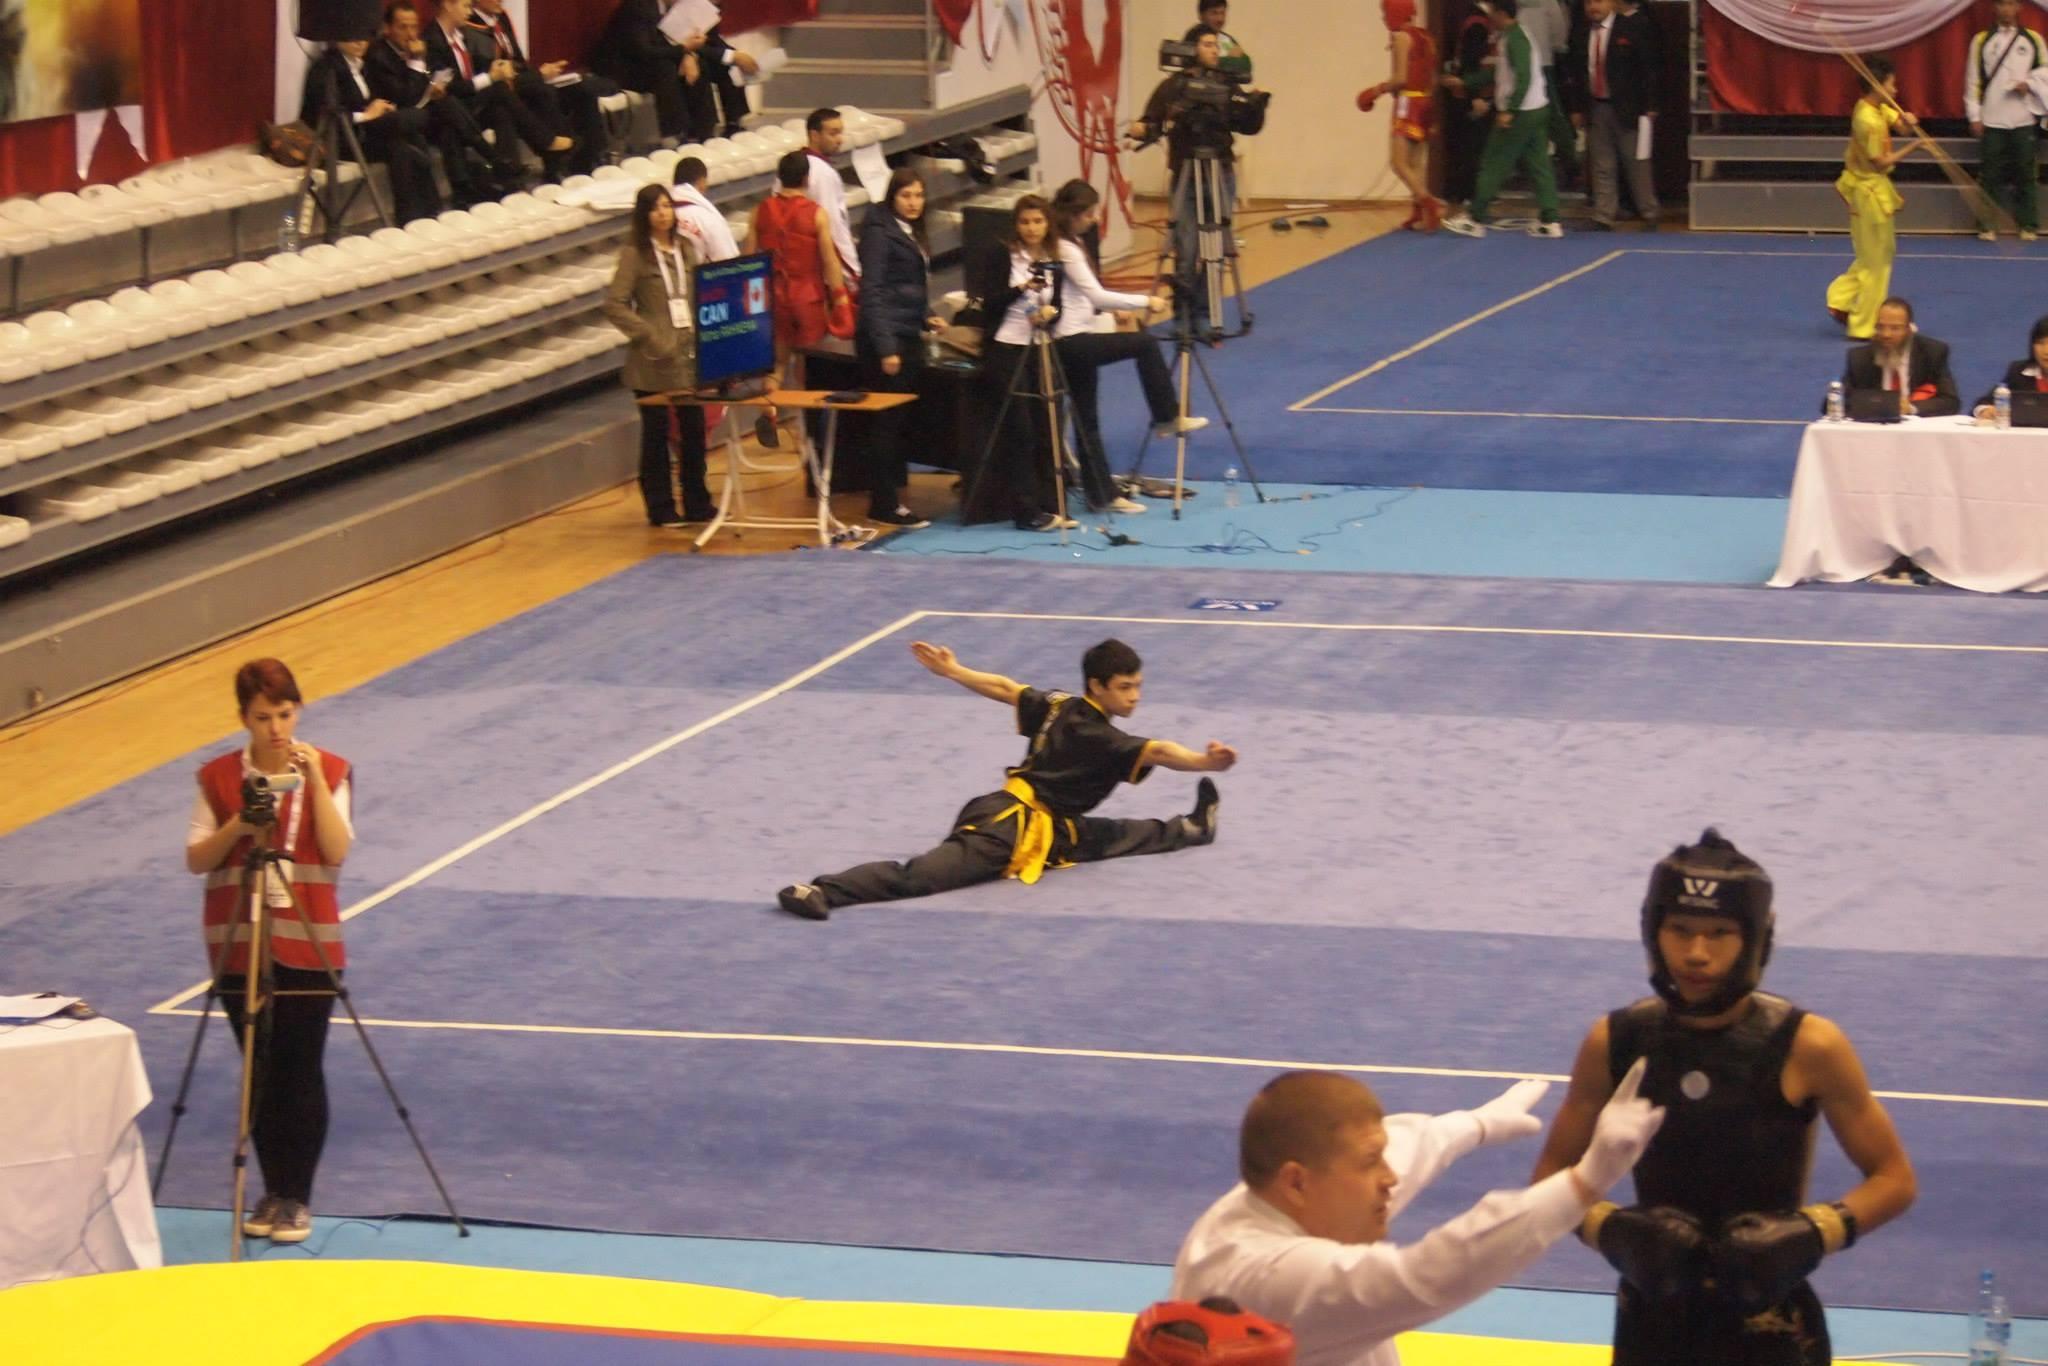 Wayland_Li_Wushu_World_Junior_Championships_2014_Team_Canada_in_Turkey_Nima_3.jpg